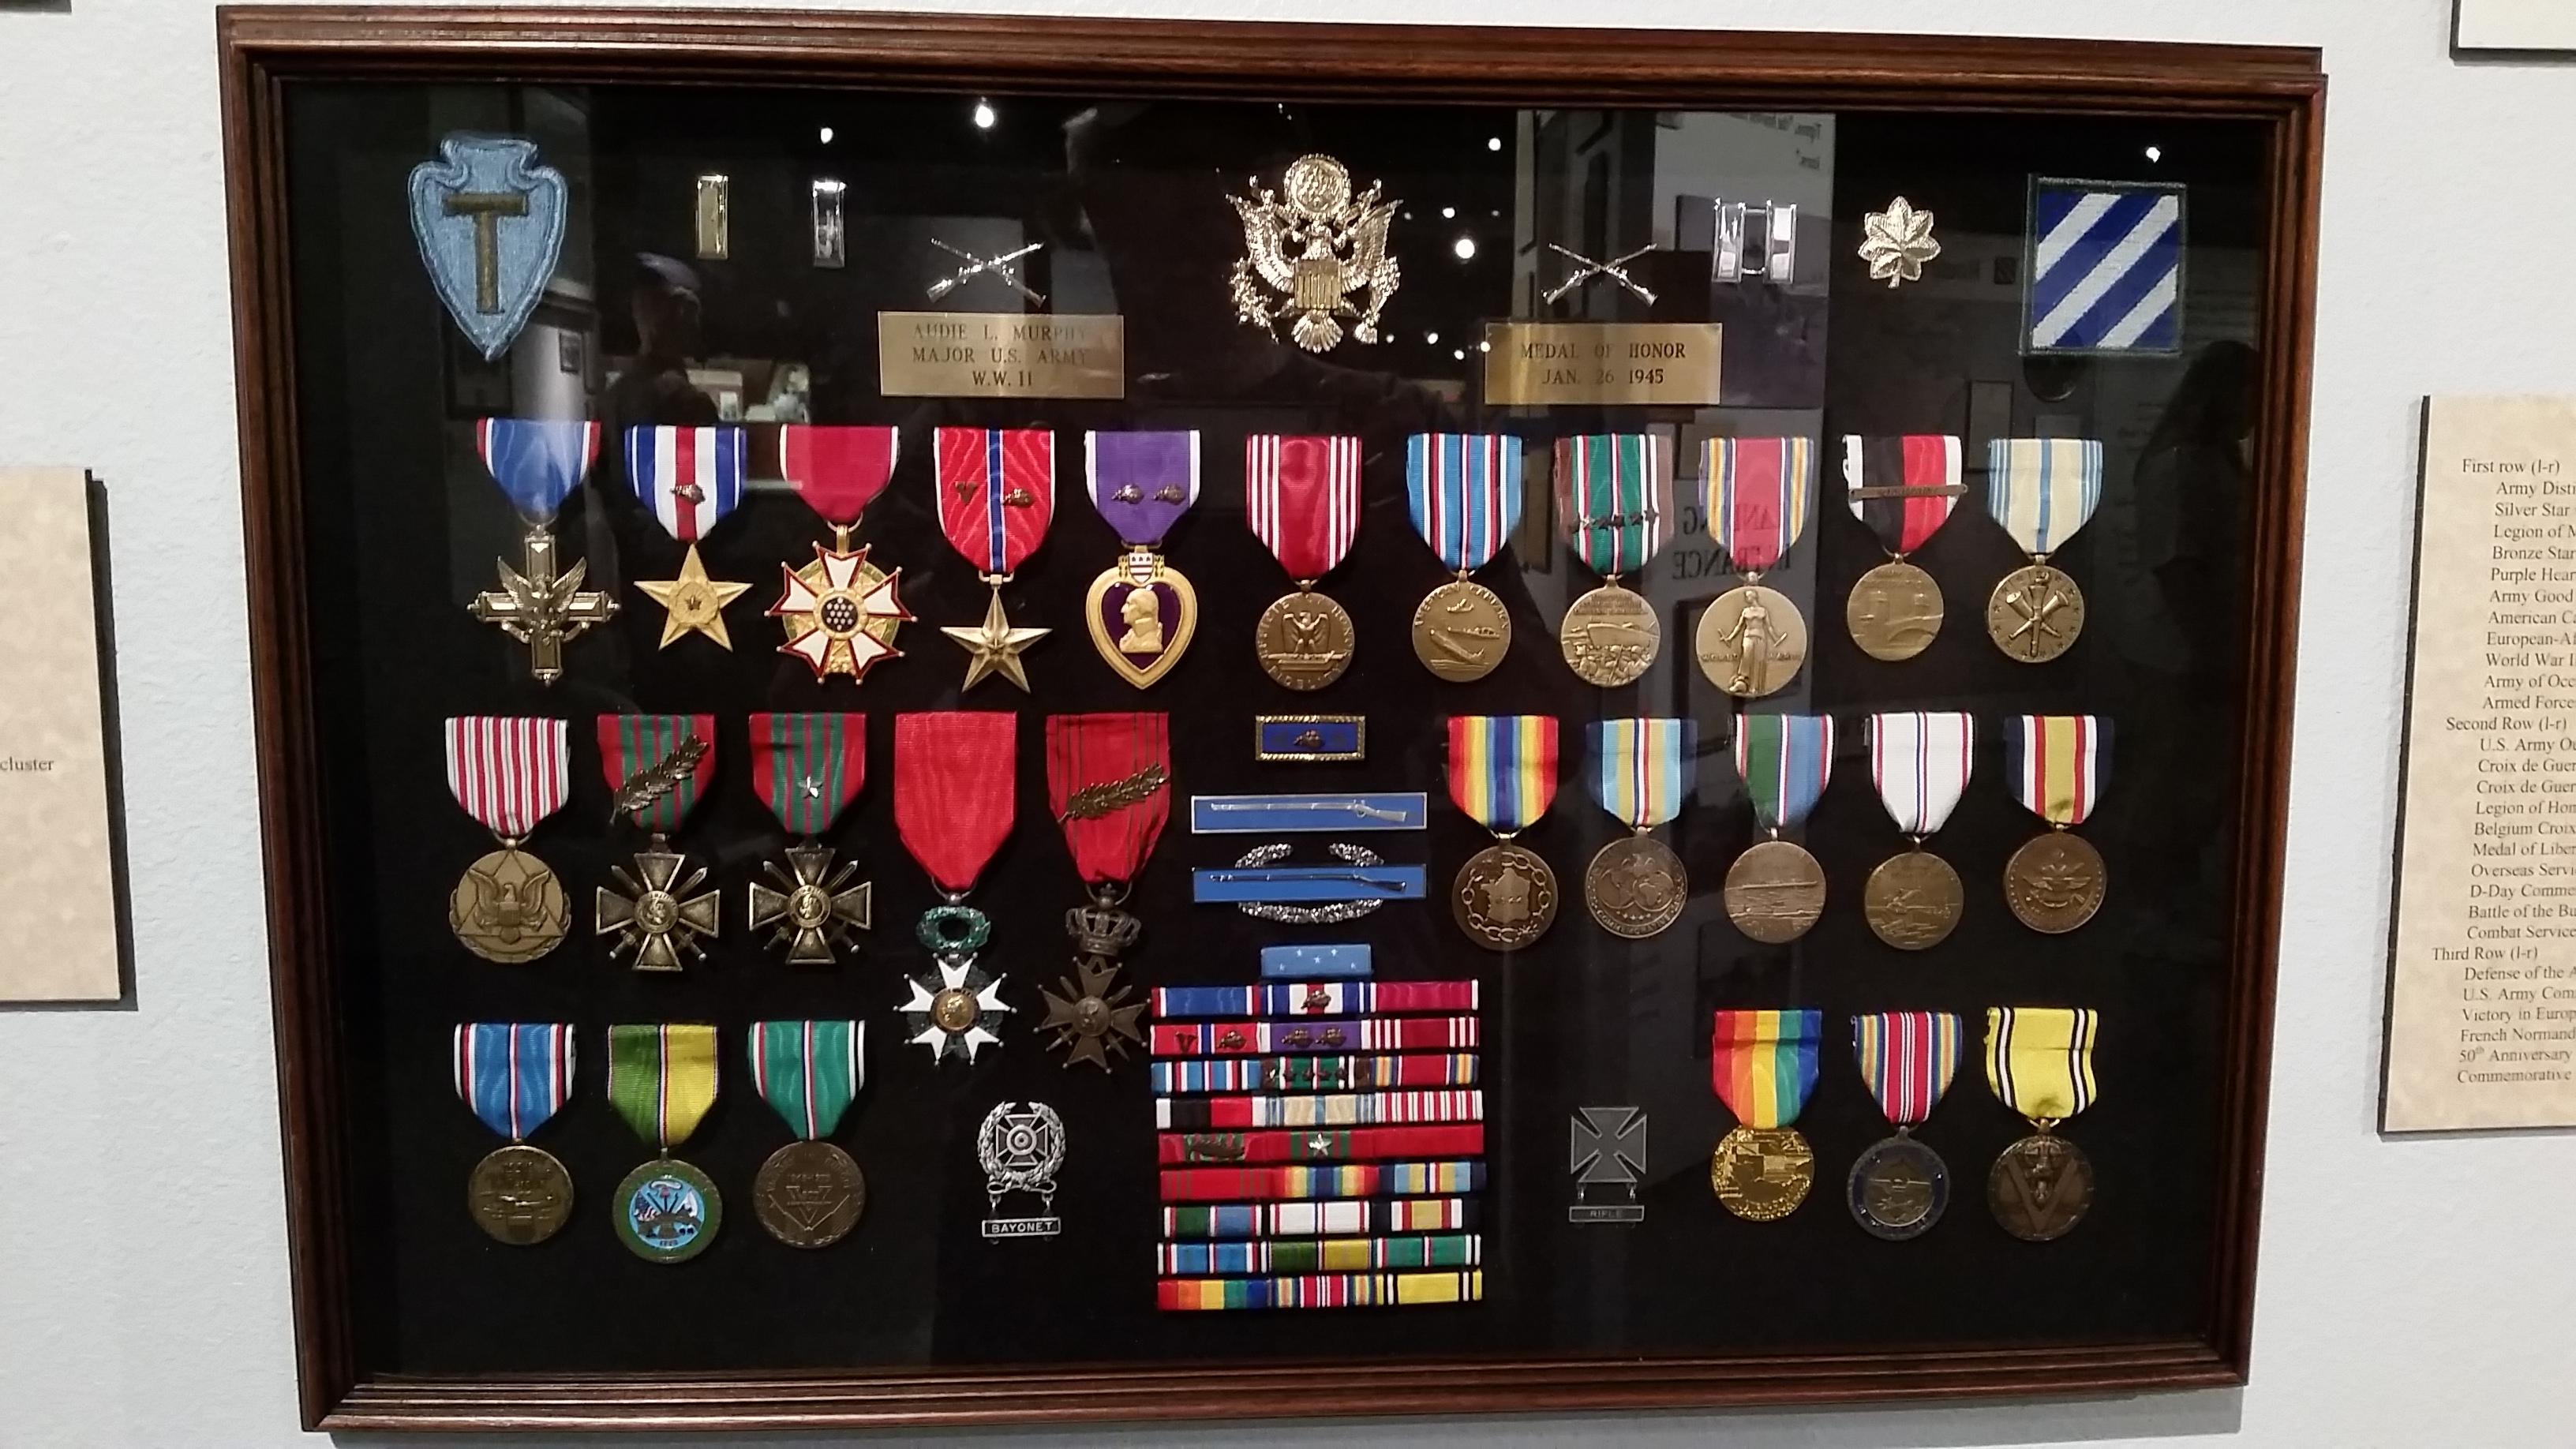 Audie Murphy Medals